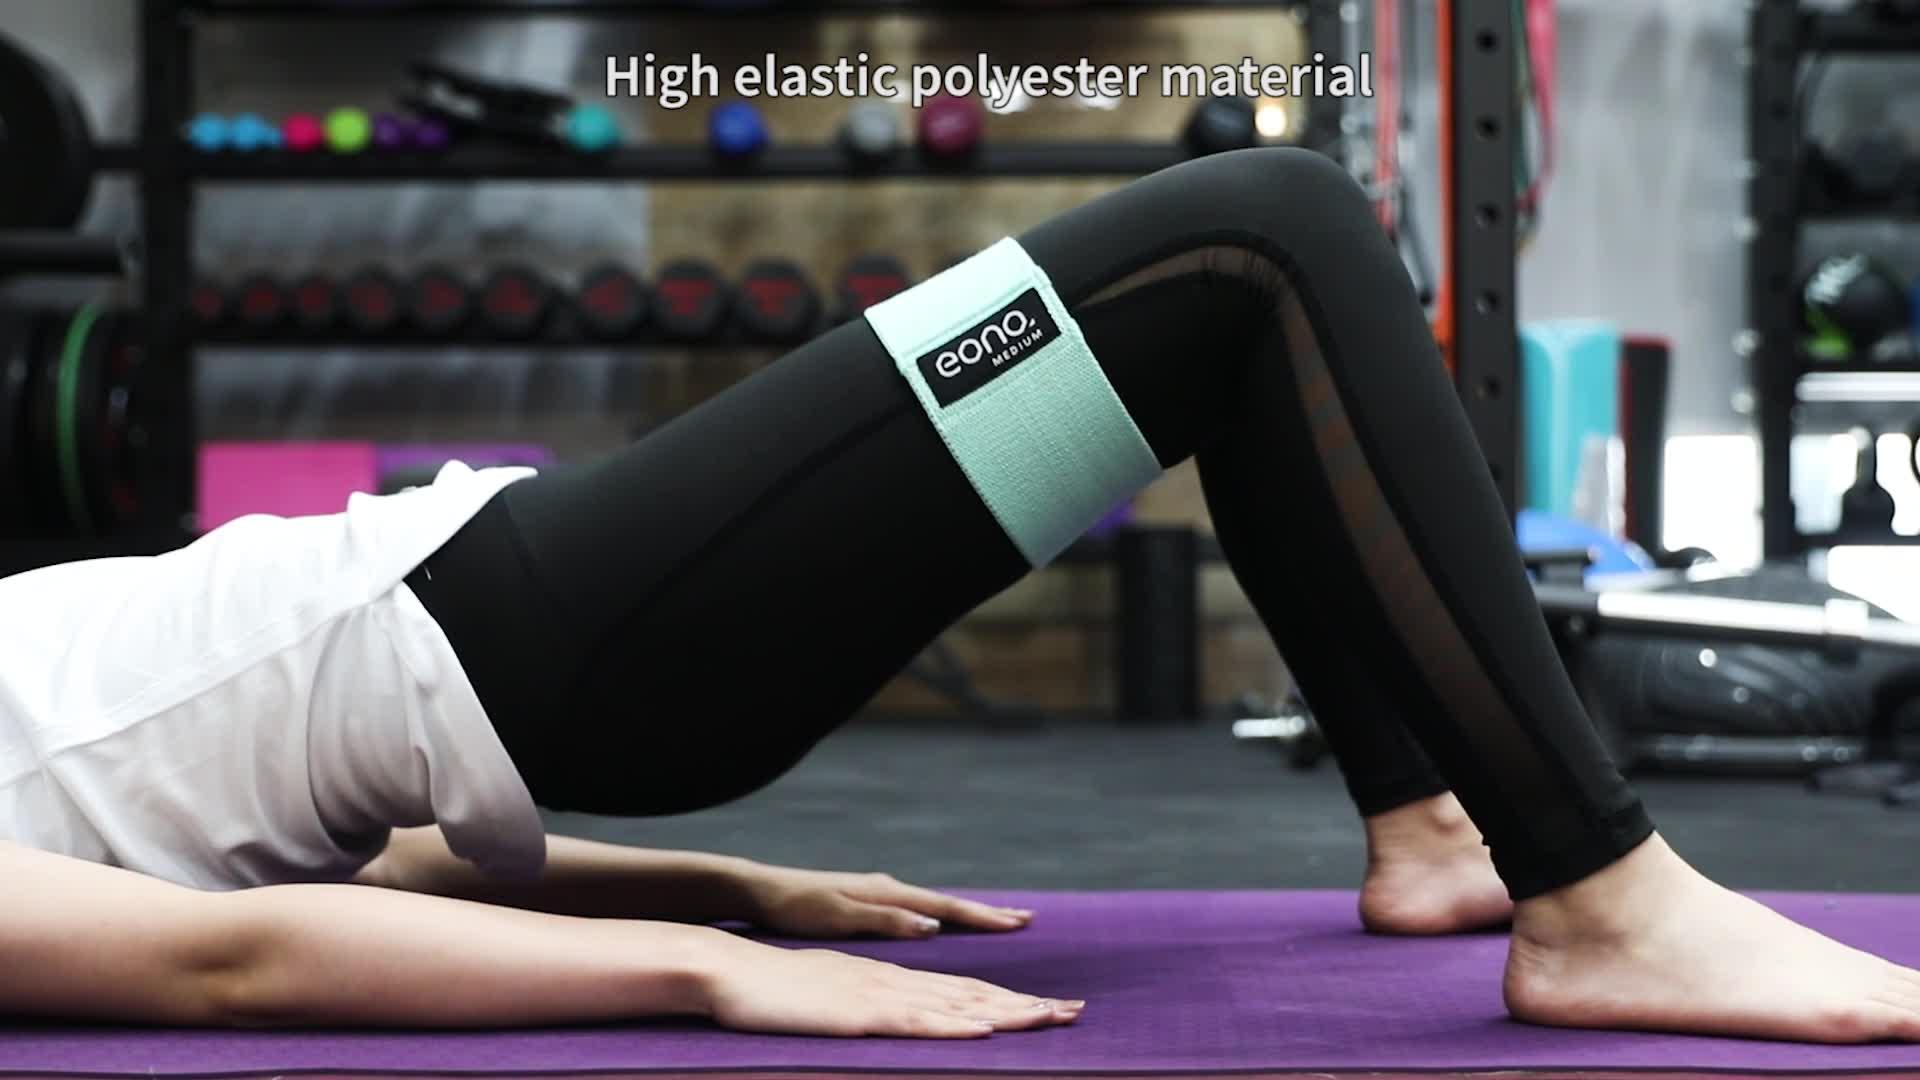 Xnuoyo Resistance Hip Bands 3 Pack Fitnessb/änder Widerstandsb/änder krafttraining Resistance Band Set Bestes Widerstandsb/änder Krafttraining f/ürs H/üften Beintraining Pilates Yoga